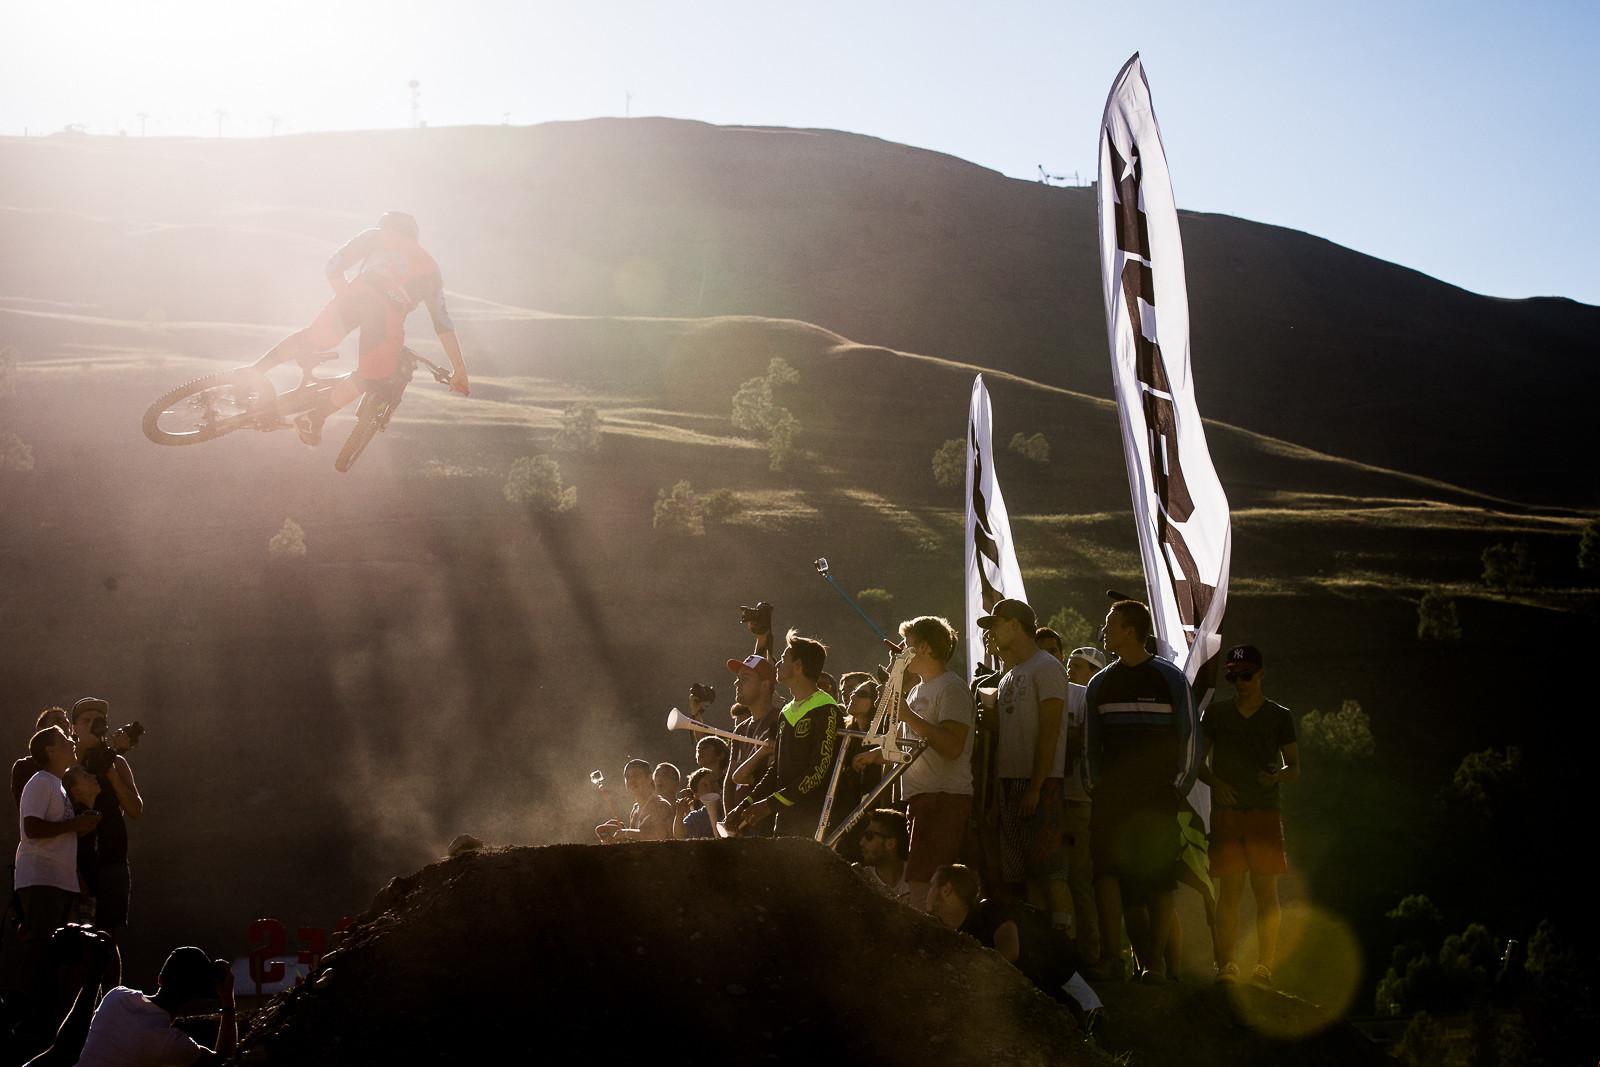 Neil Stewart, Whip Off European Champs, Crankworx L2A - Whip Off European Champs, Crankworx L2A - Mountain Biking Pictures - Vital MTB